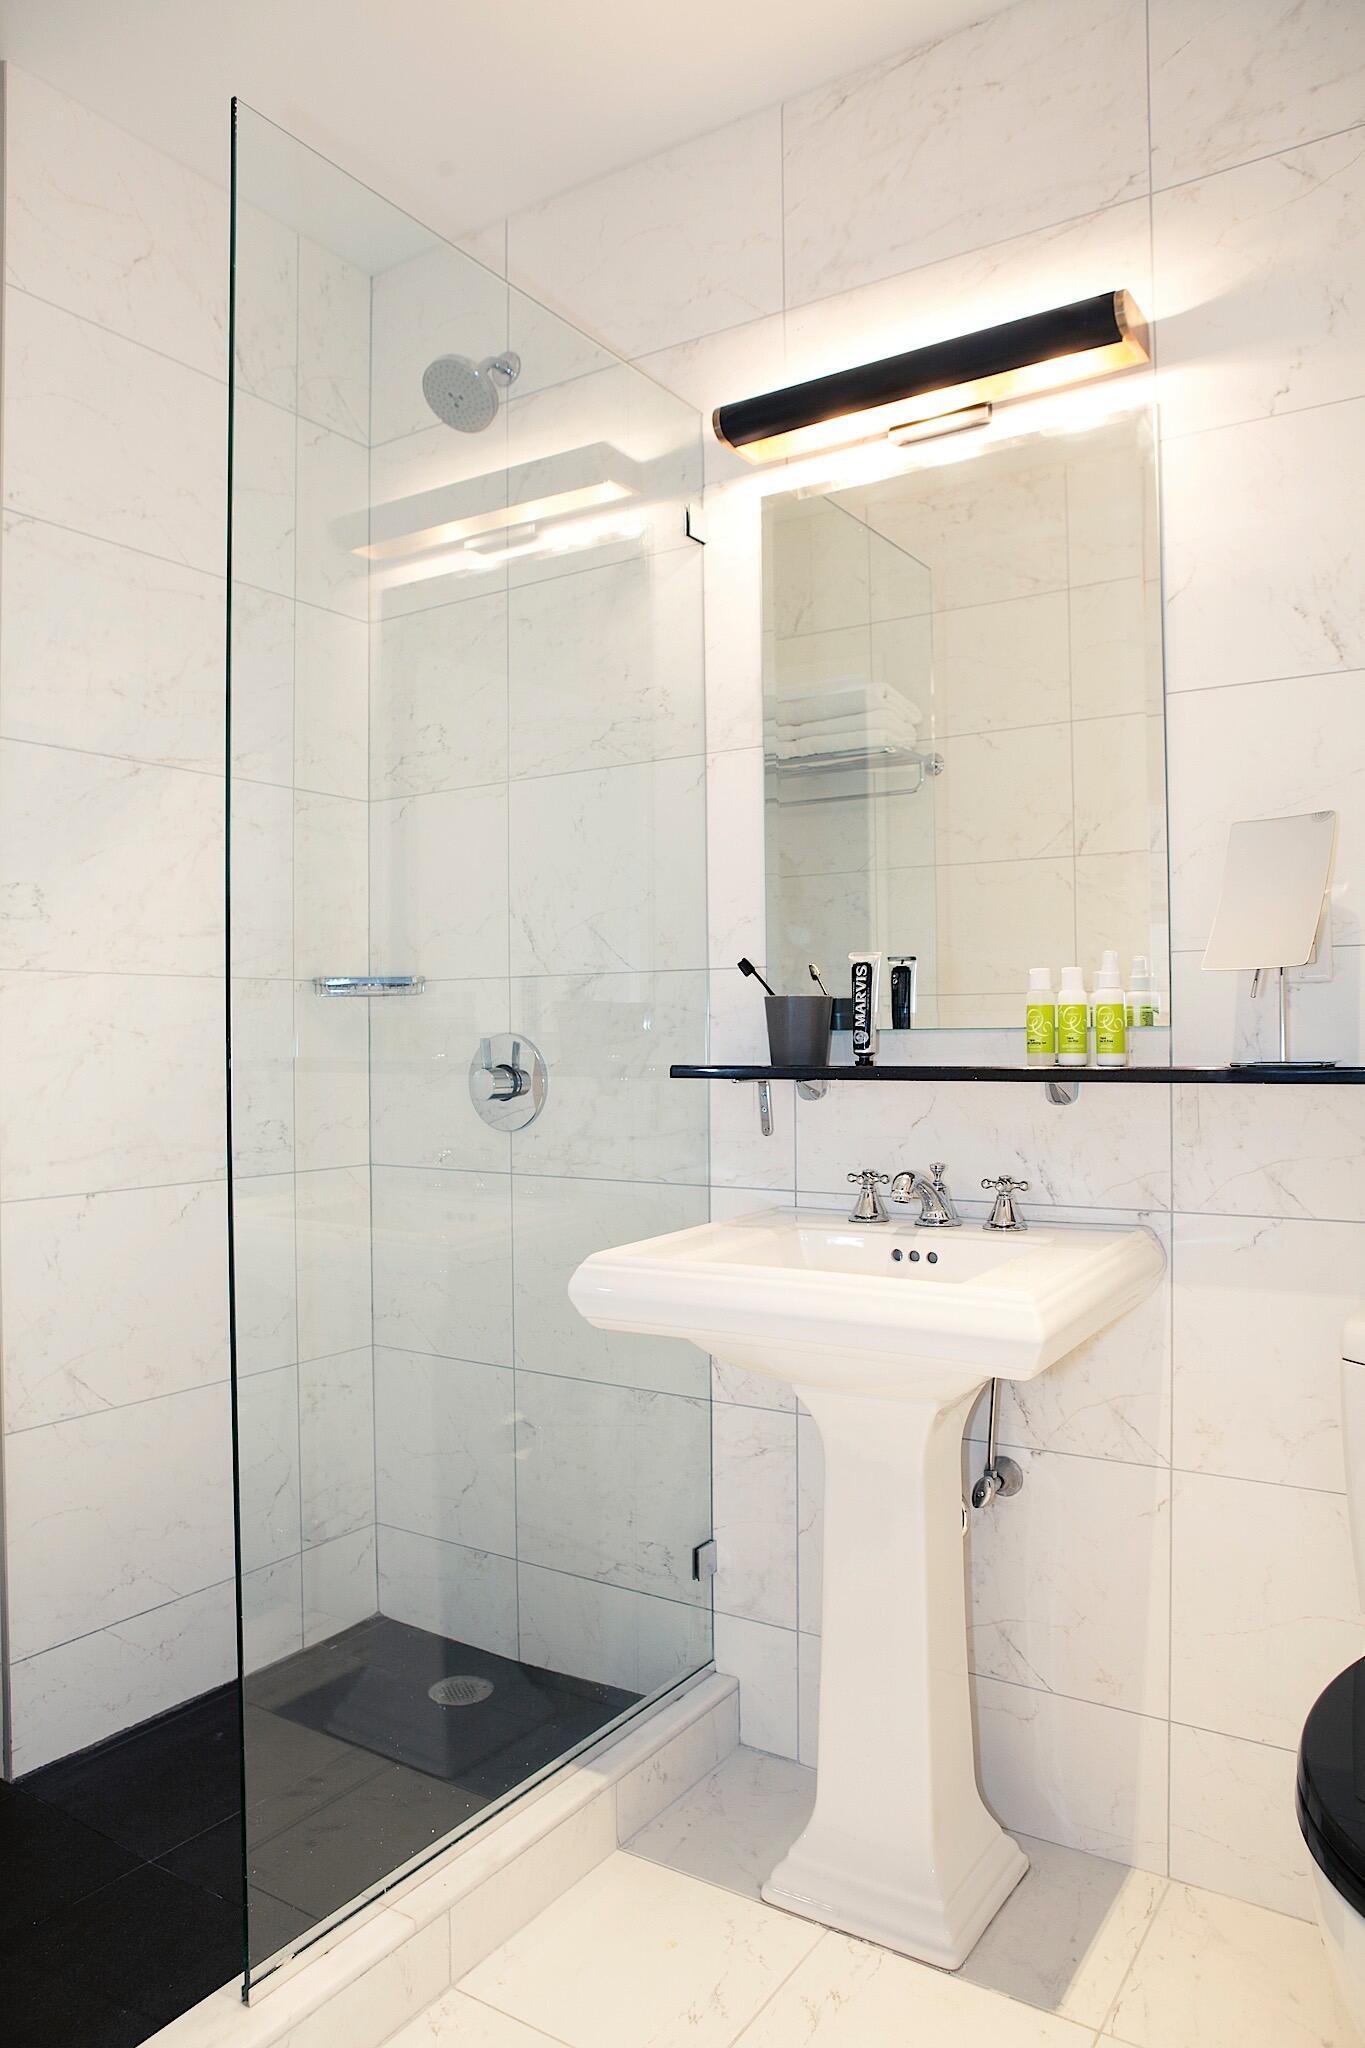 Suite Bathroom Interior with pedestal sink